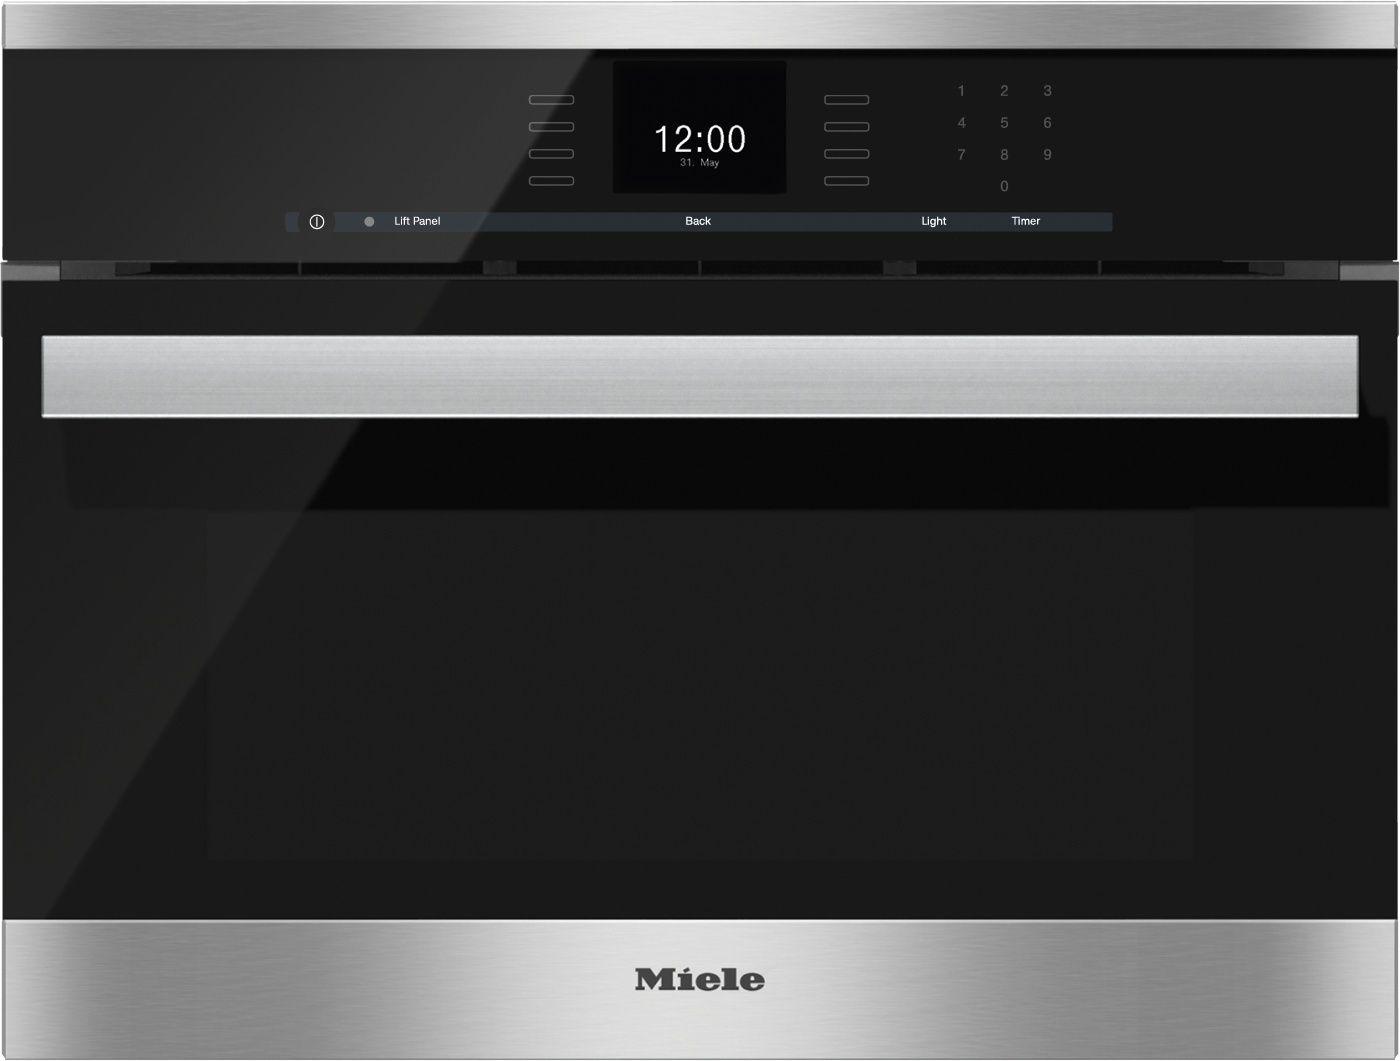 Miele 24 Dgc 6600 Xl Pureline Sensortronic Combi Steam Oven